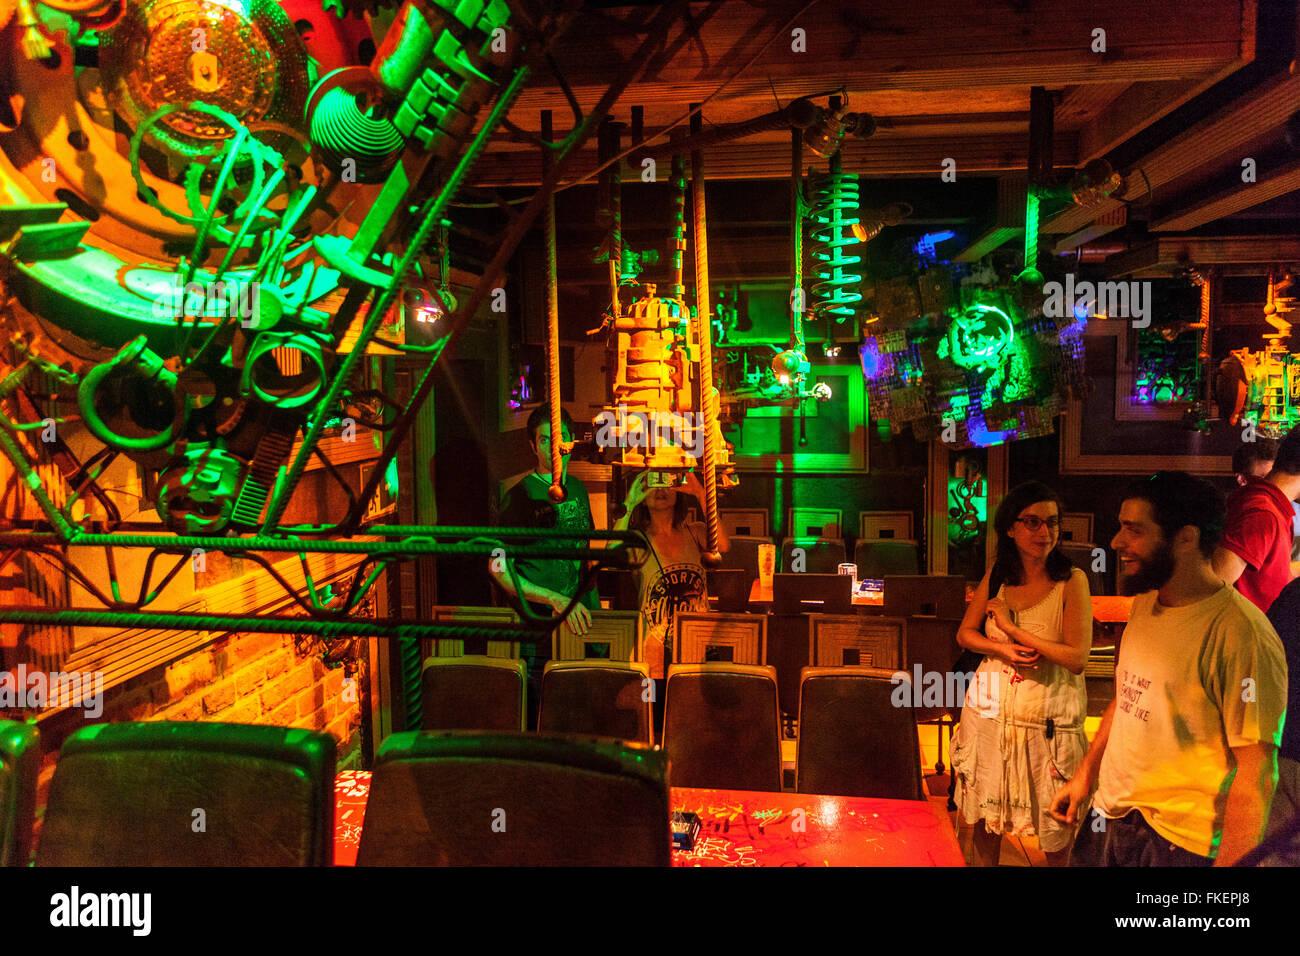 Cross Club Lieblingsmusik club, Nachtleben, Prag Holesovice, Tschechische Republik Stockbild